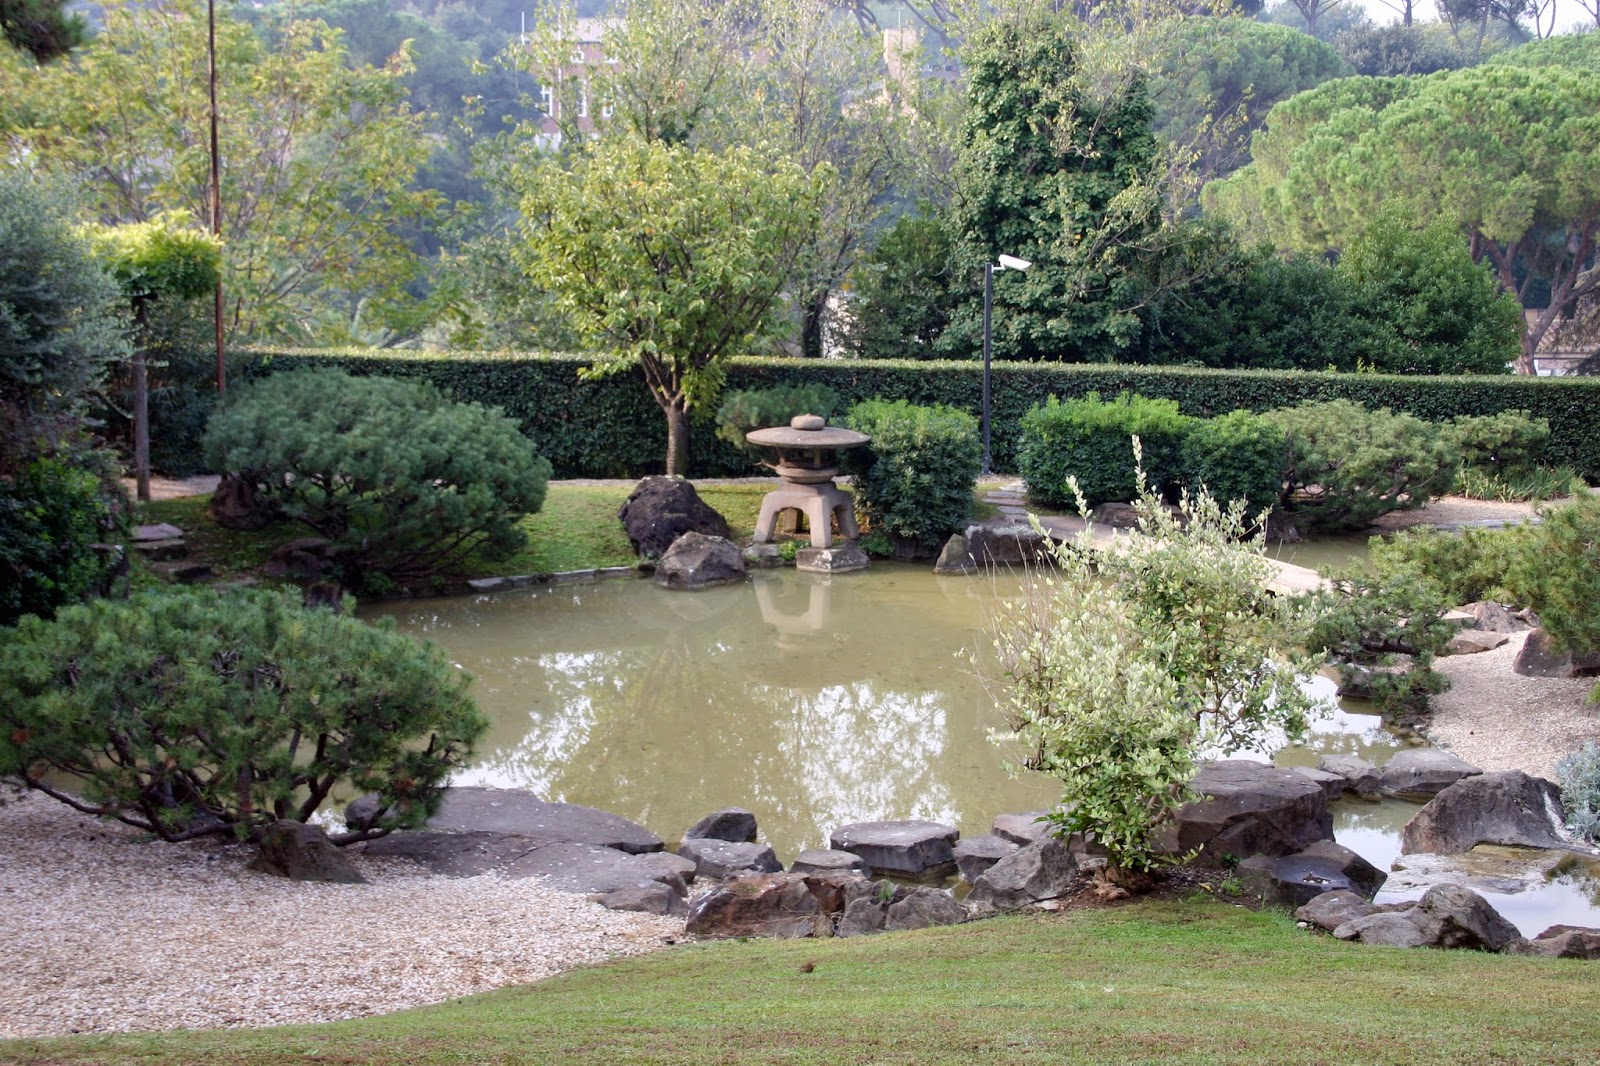 Aprono a roma i giardini giapponesi - Giardini giapponesi ...